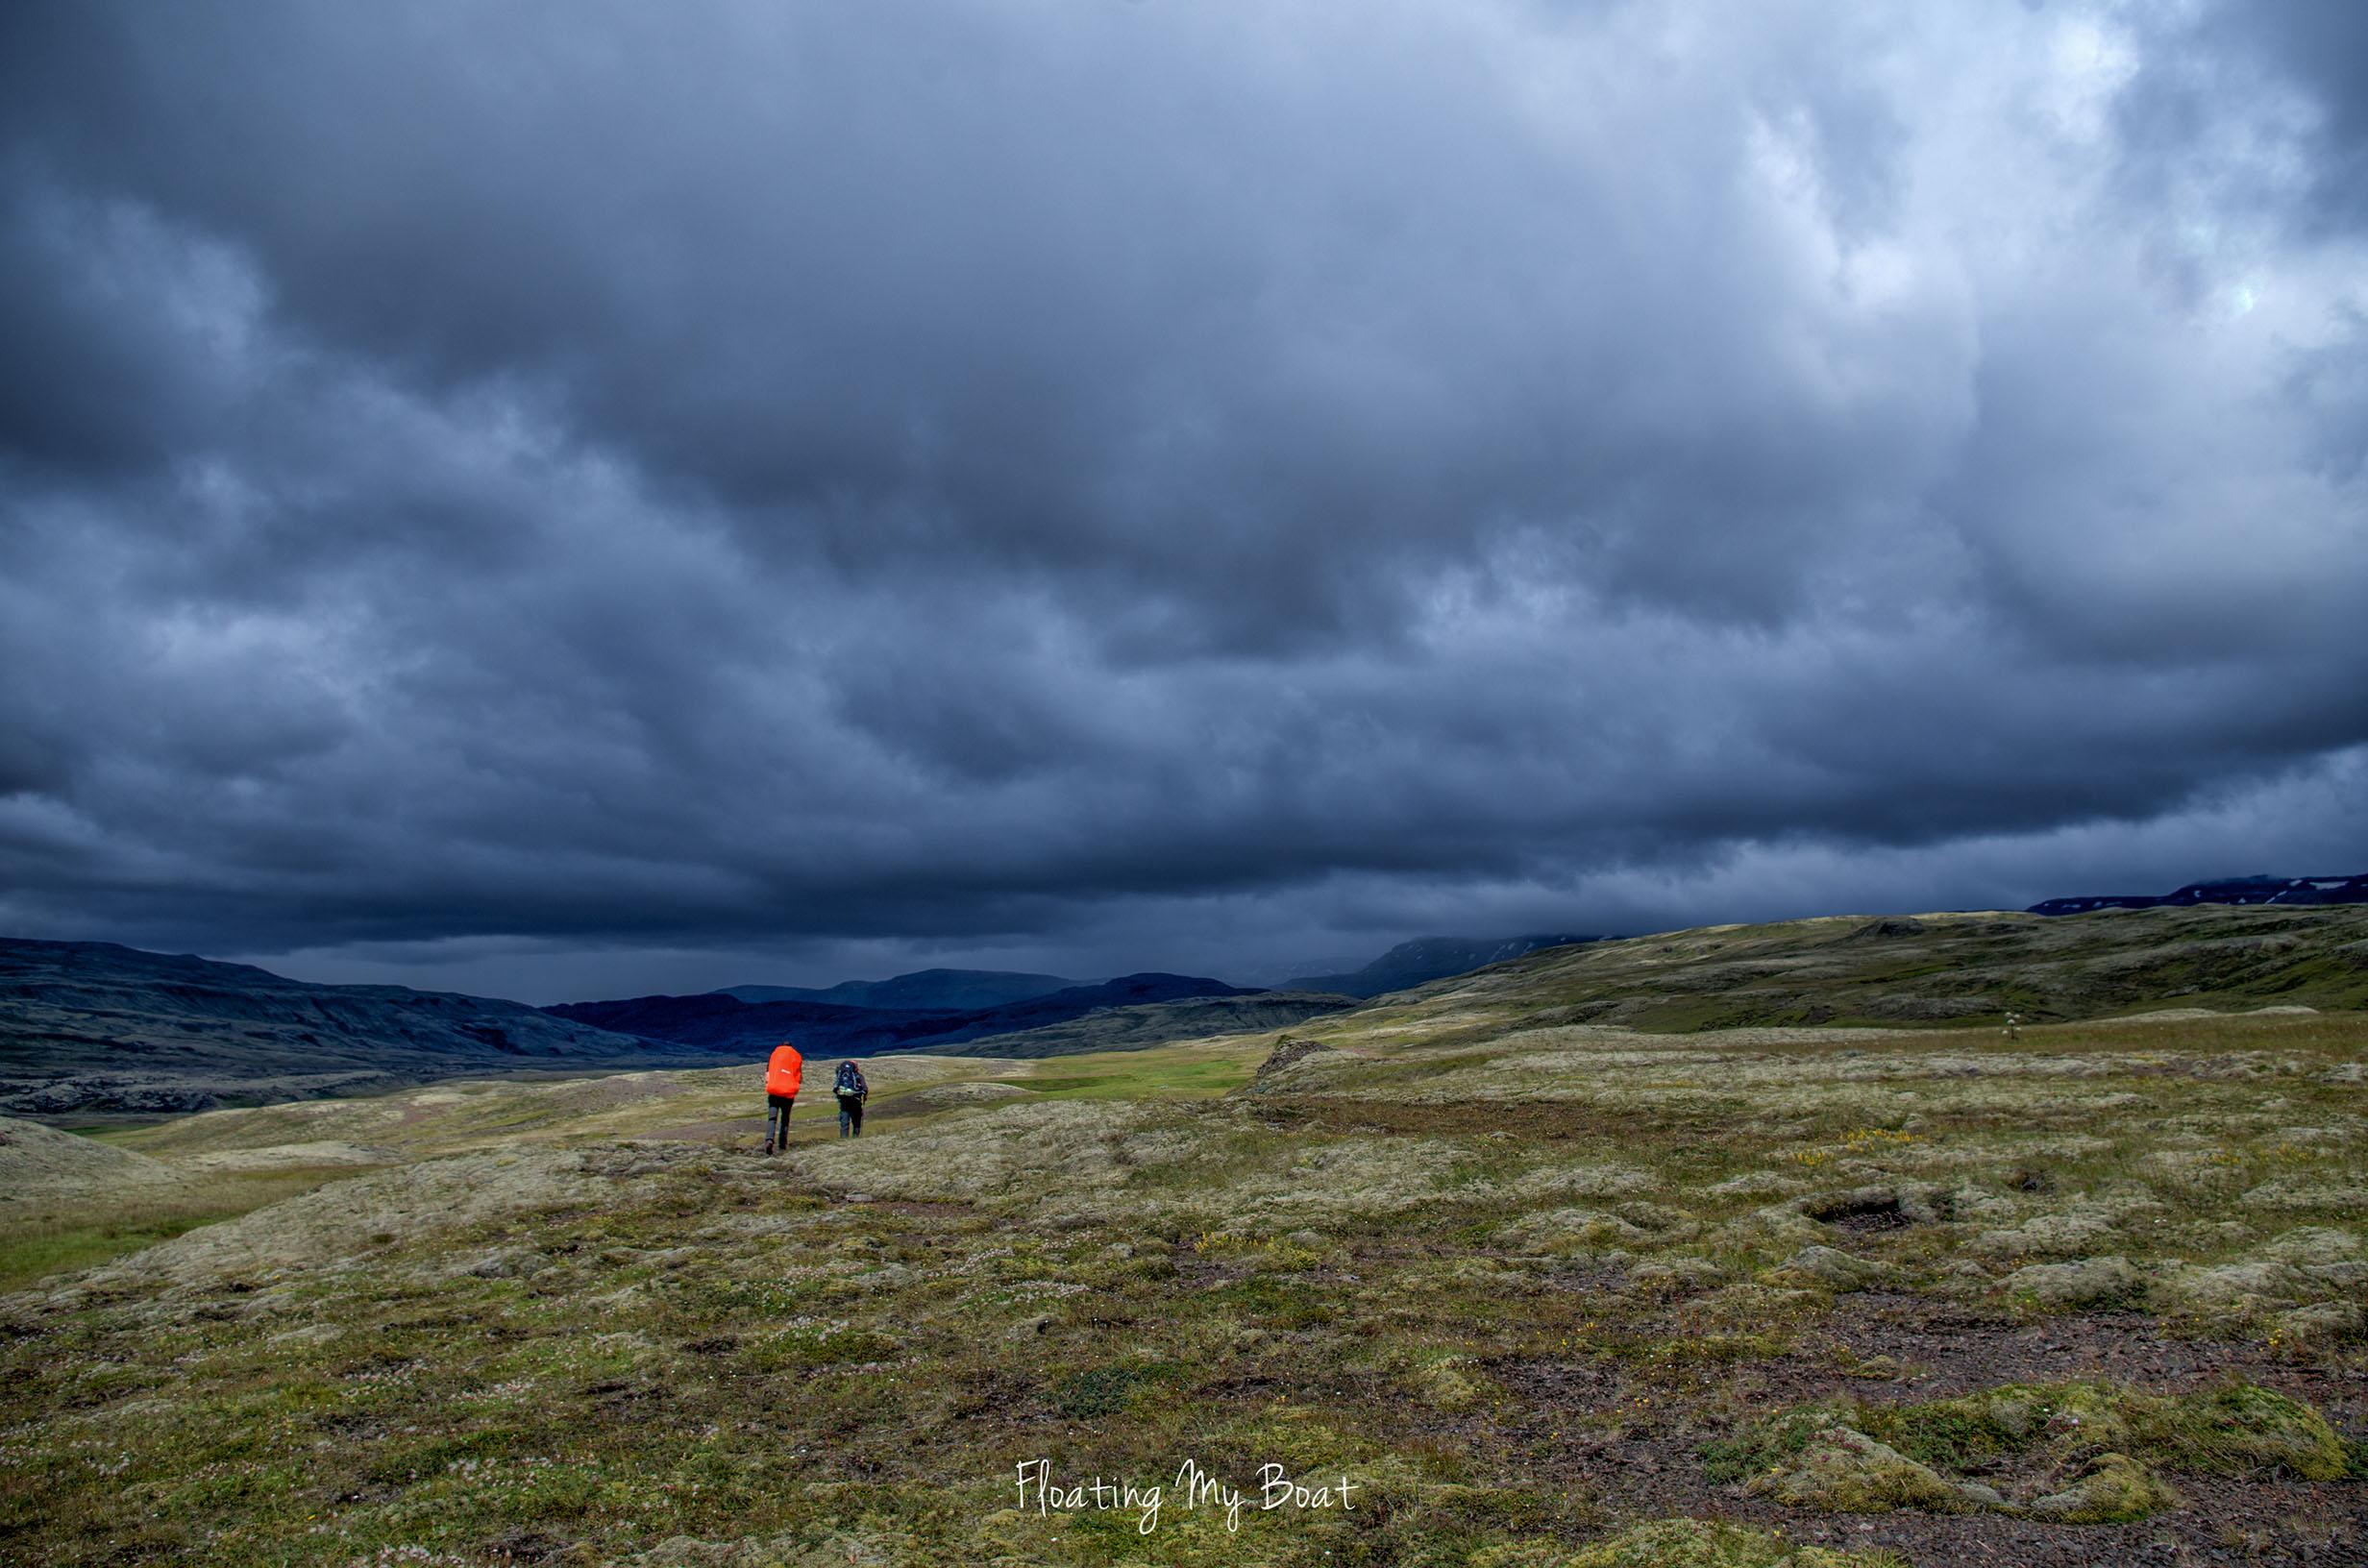 vatnajokull-iceland-trekking-day-one-11